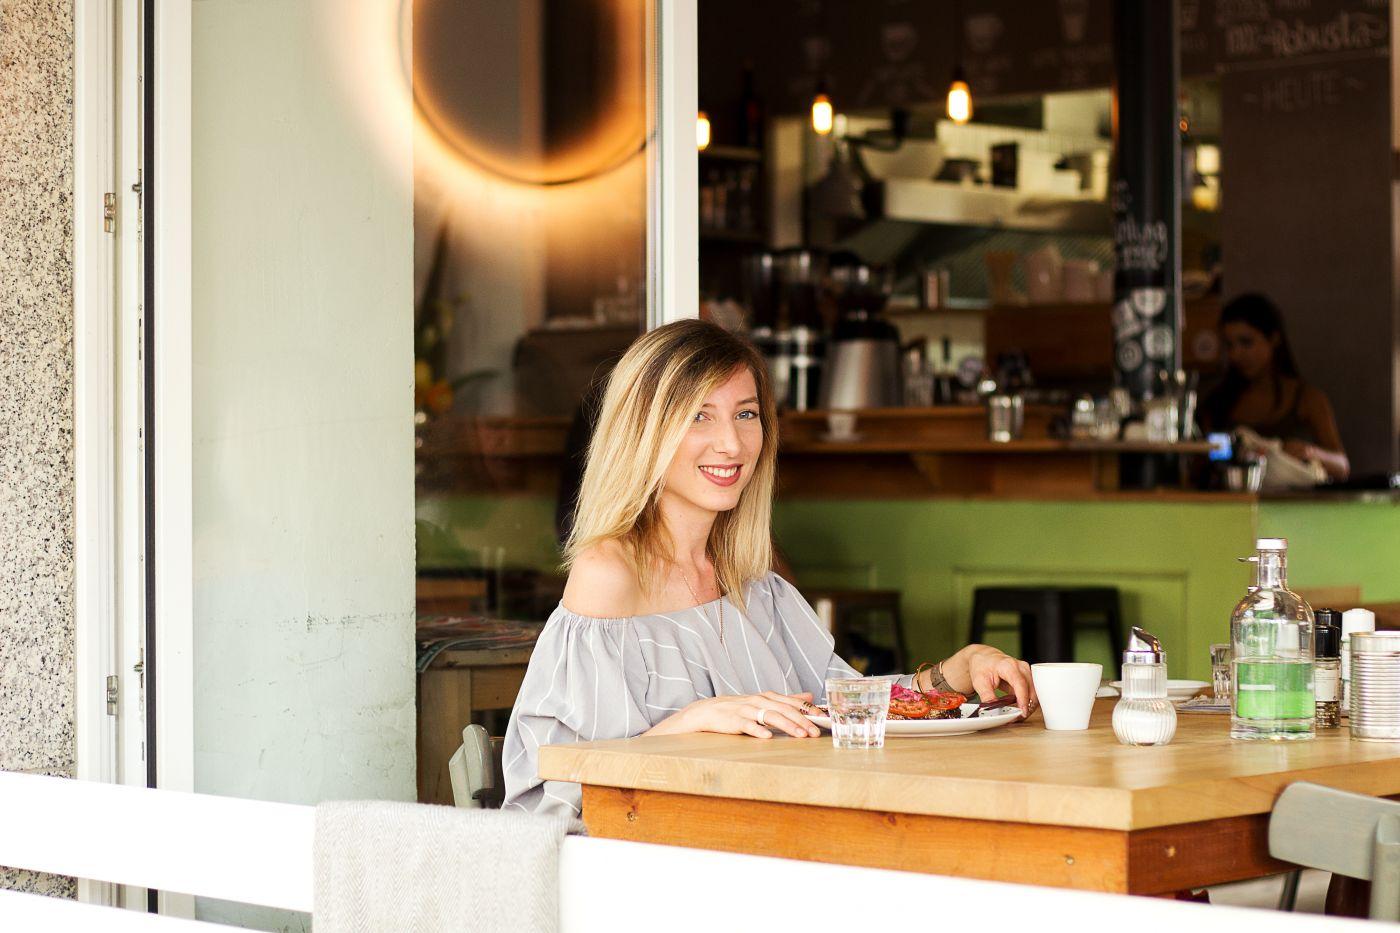 Dating cafe kündigen